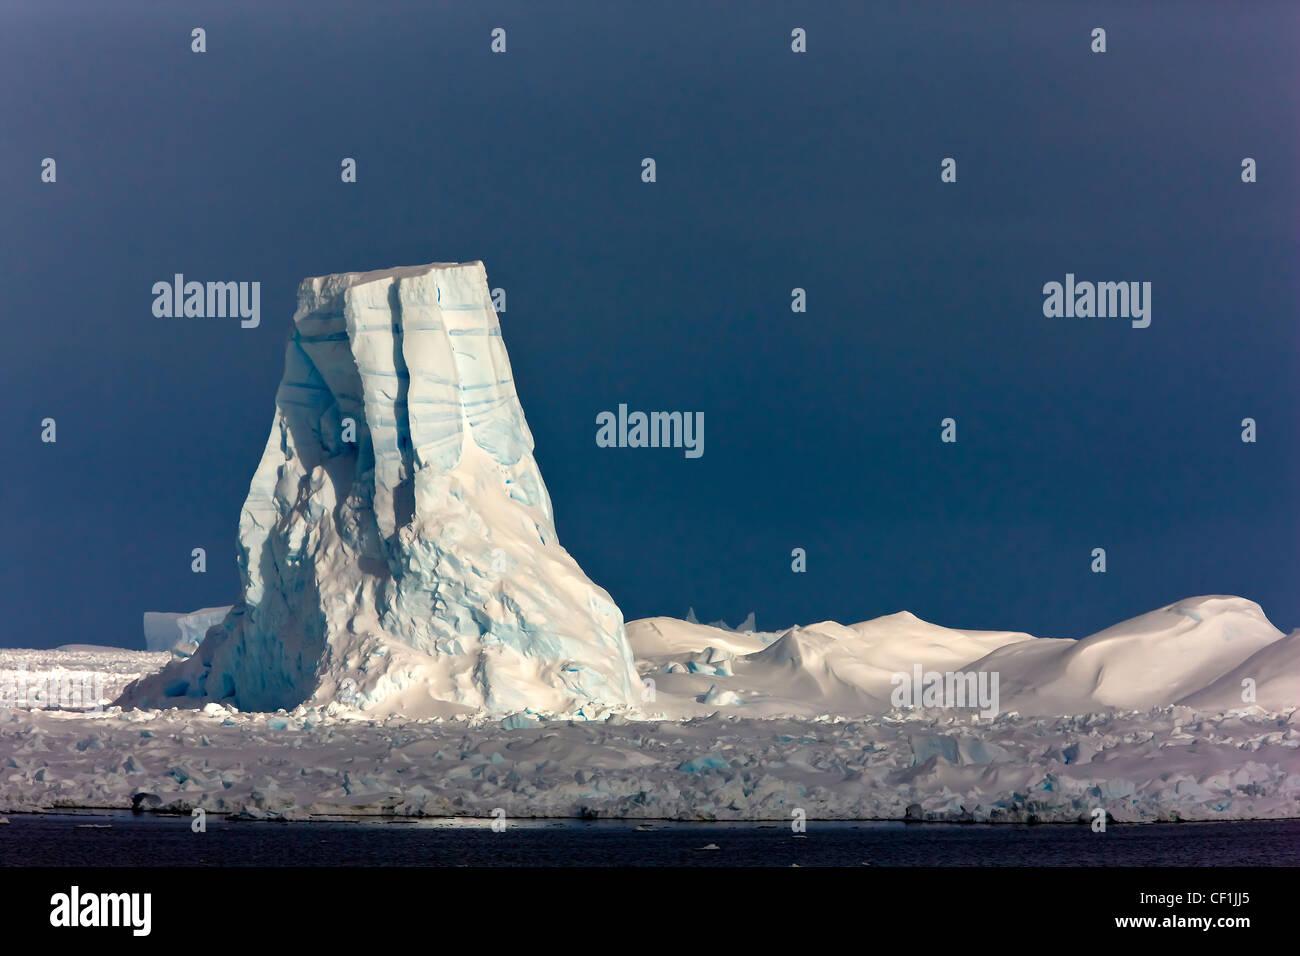 Iceberg Sculpture Antarctica phantom coast - Stock Image